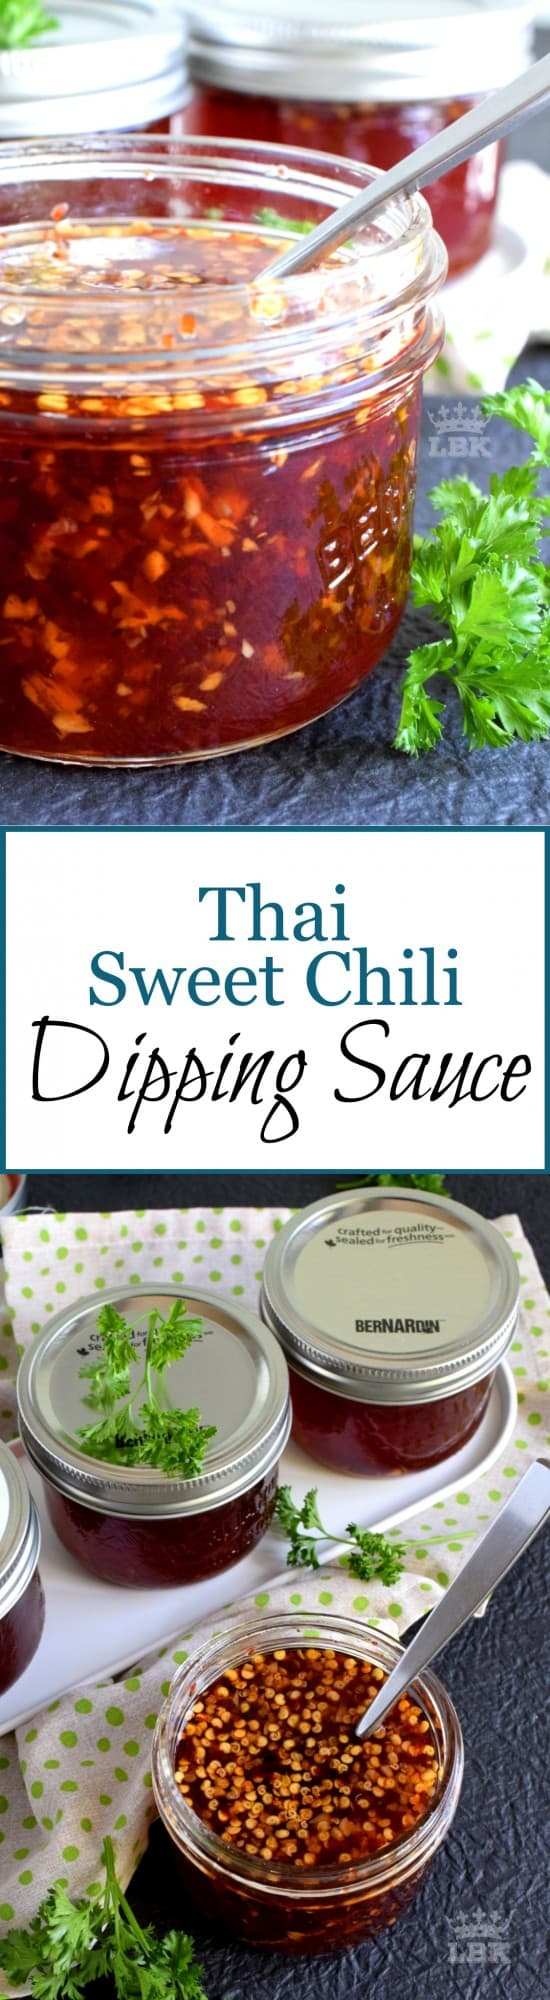 Thai Sweet Chili Dipping Sauce